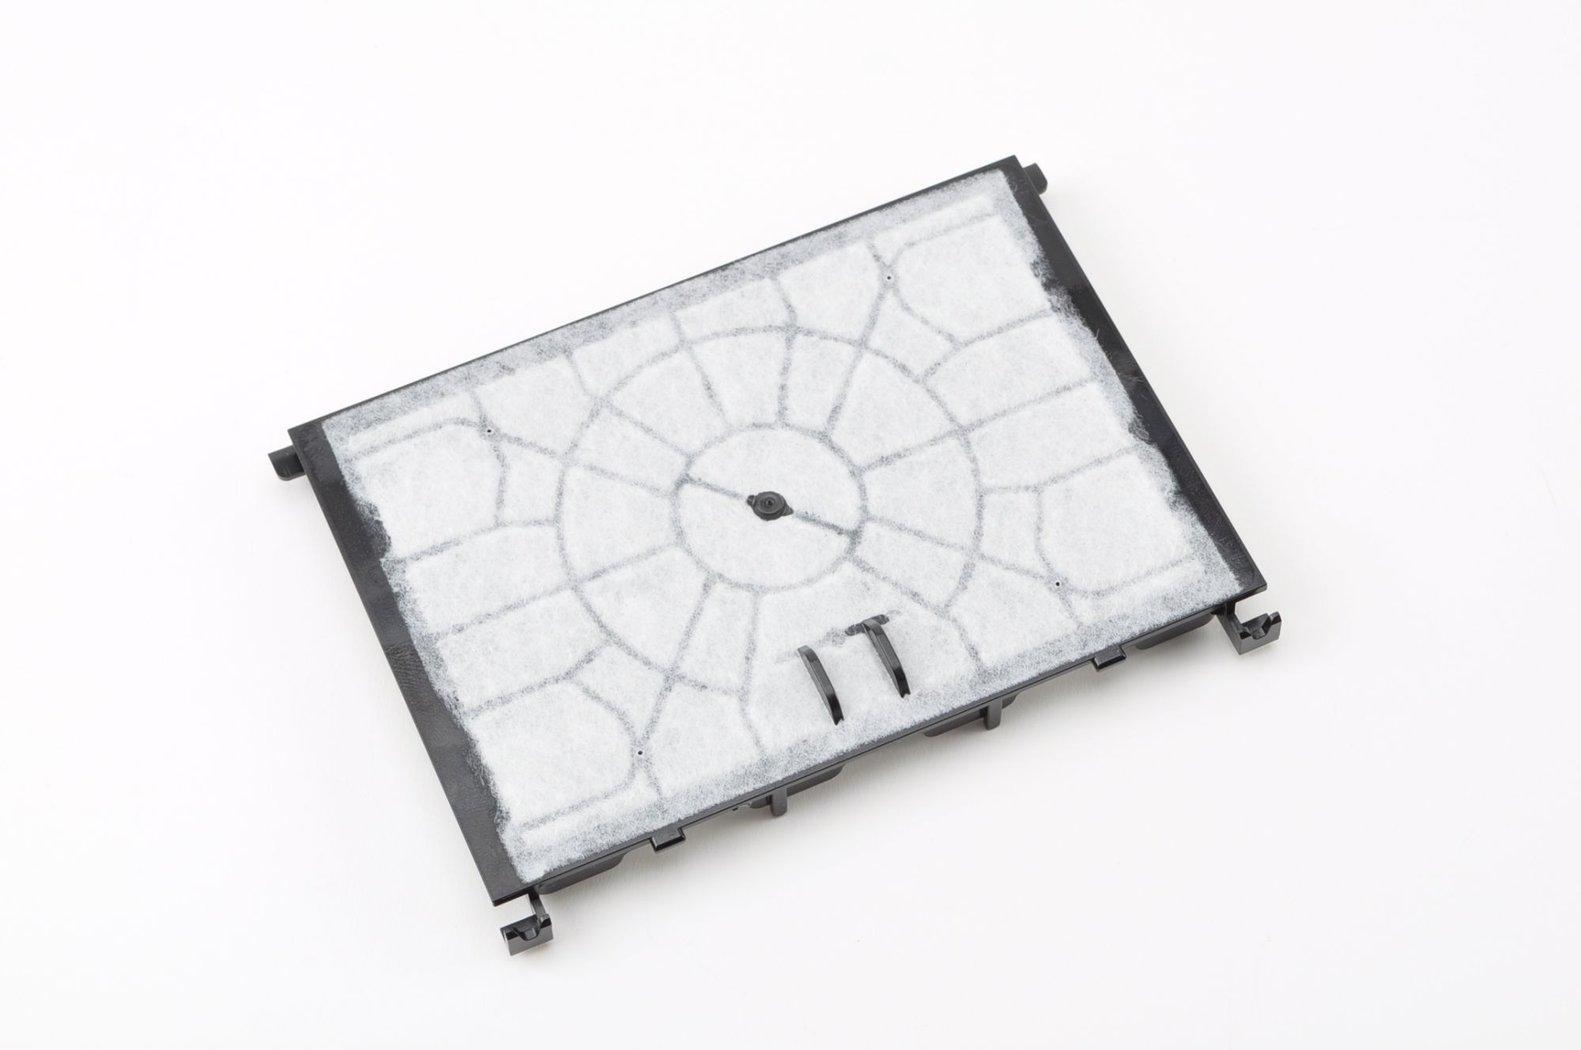 siemens staubsauger motorfilter motor schutz filter 160mm x 111mm 00579421 ebay. Black Bedroom Furniture Sets. Home Design Ideas